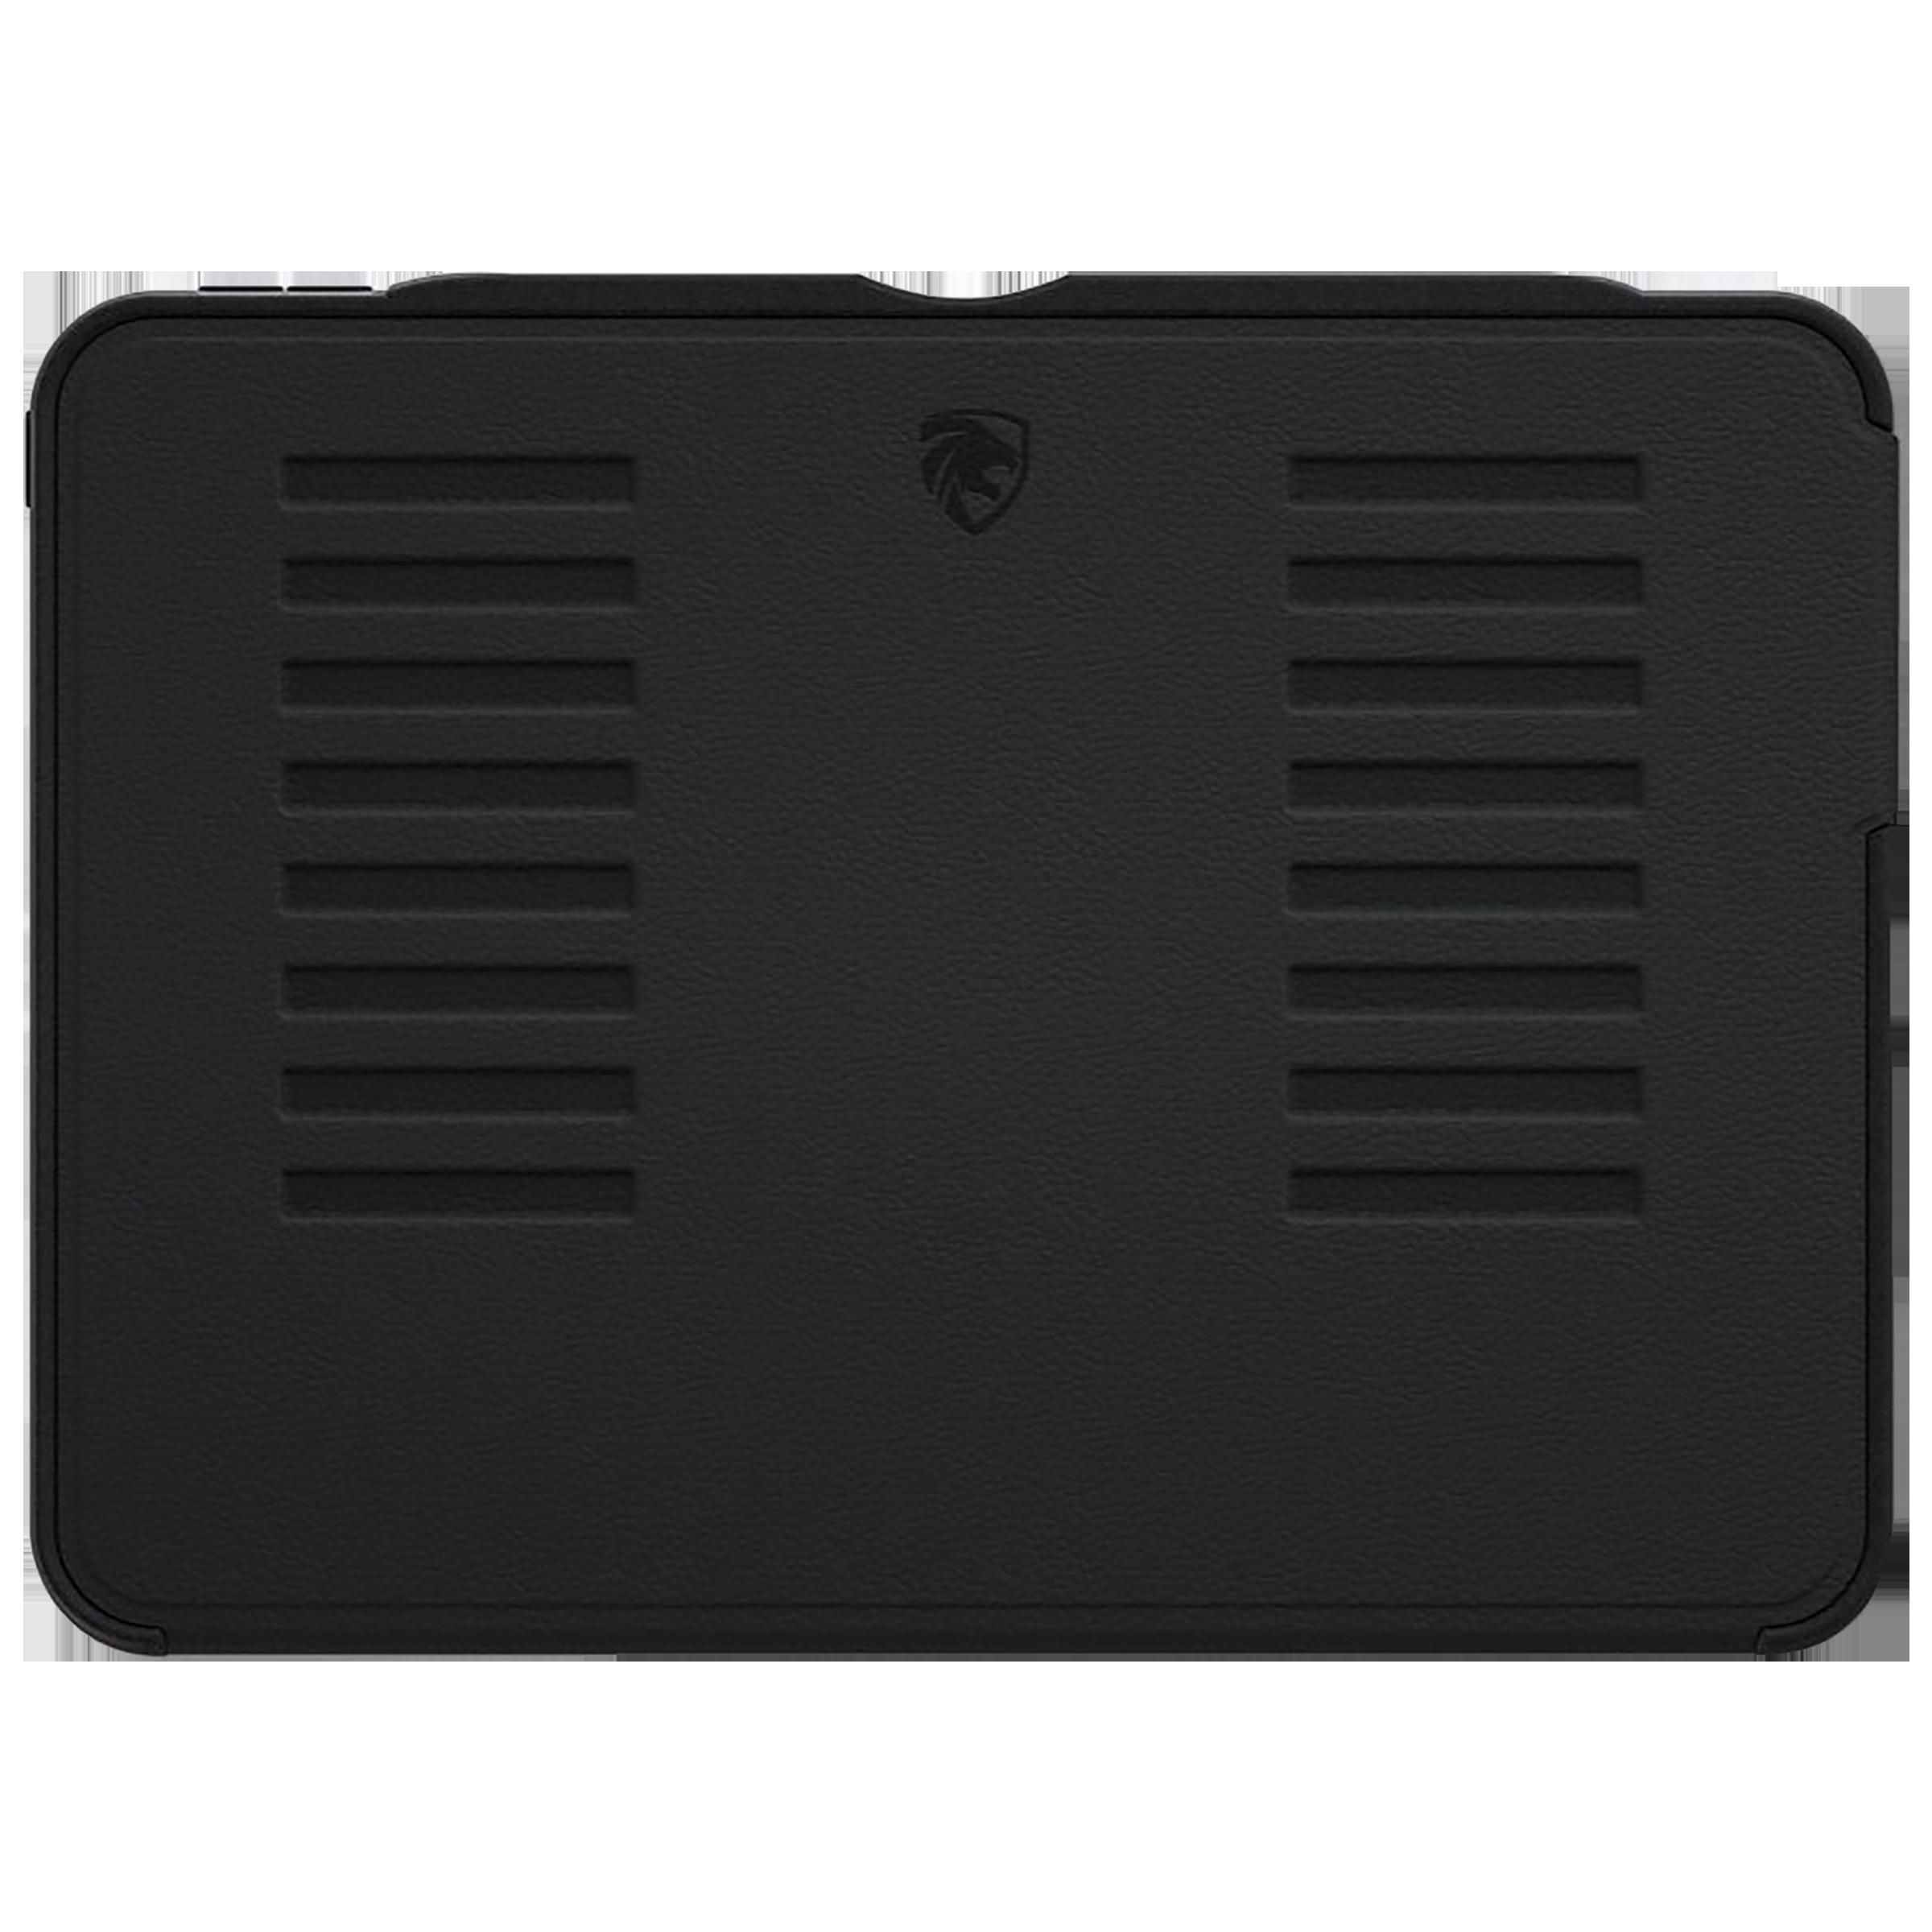 Zugu Alpha Polycarbonate Back Case with Stand For iPad Pro 12.9 (4th Gen) (Soft Microfiber Interior, ZG-20-129BLK, Black)_1